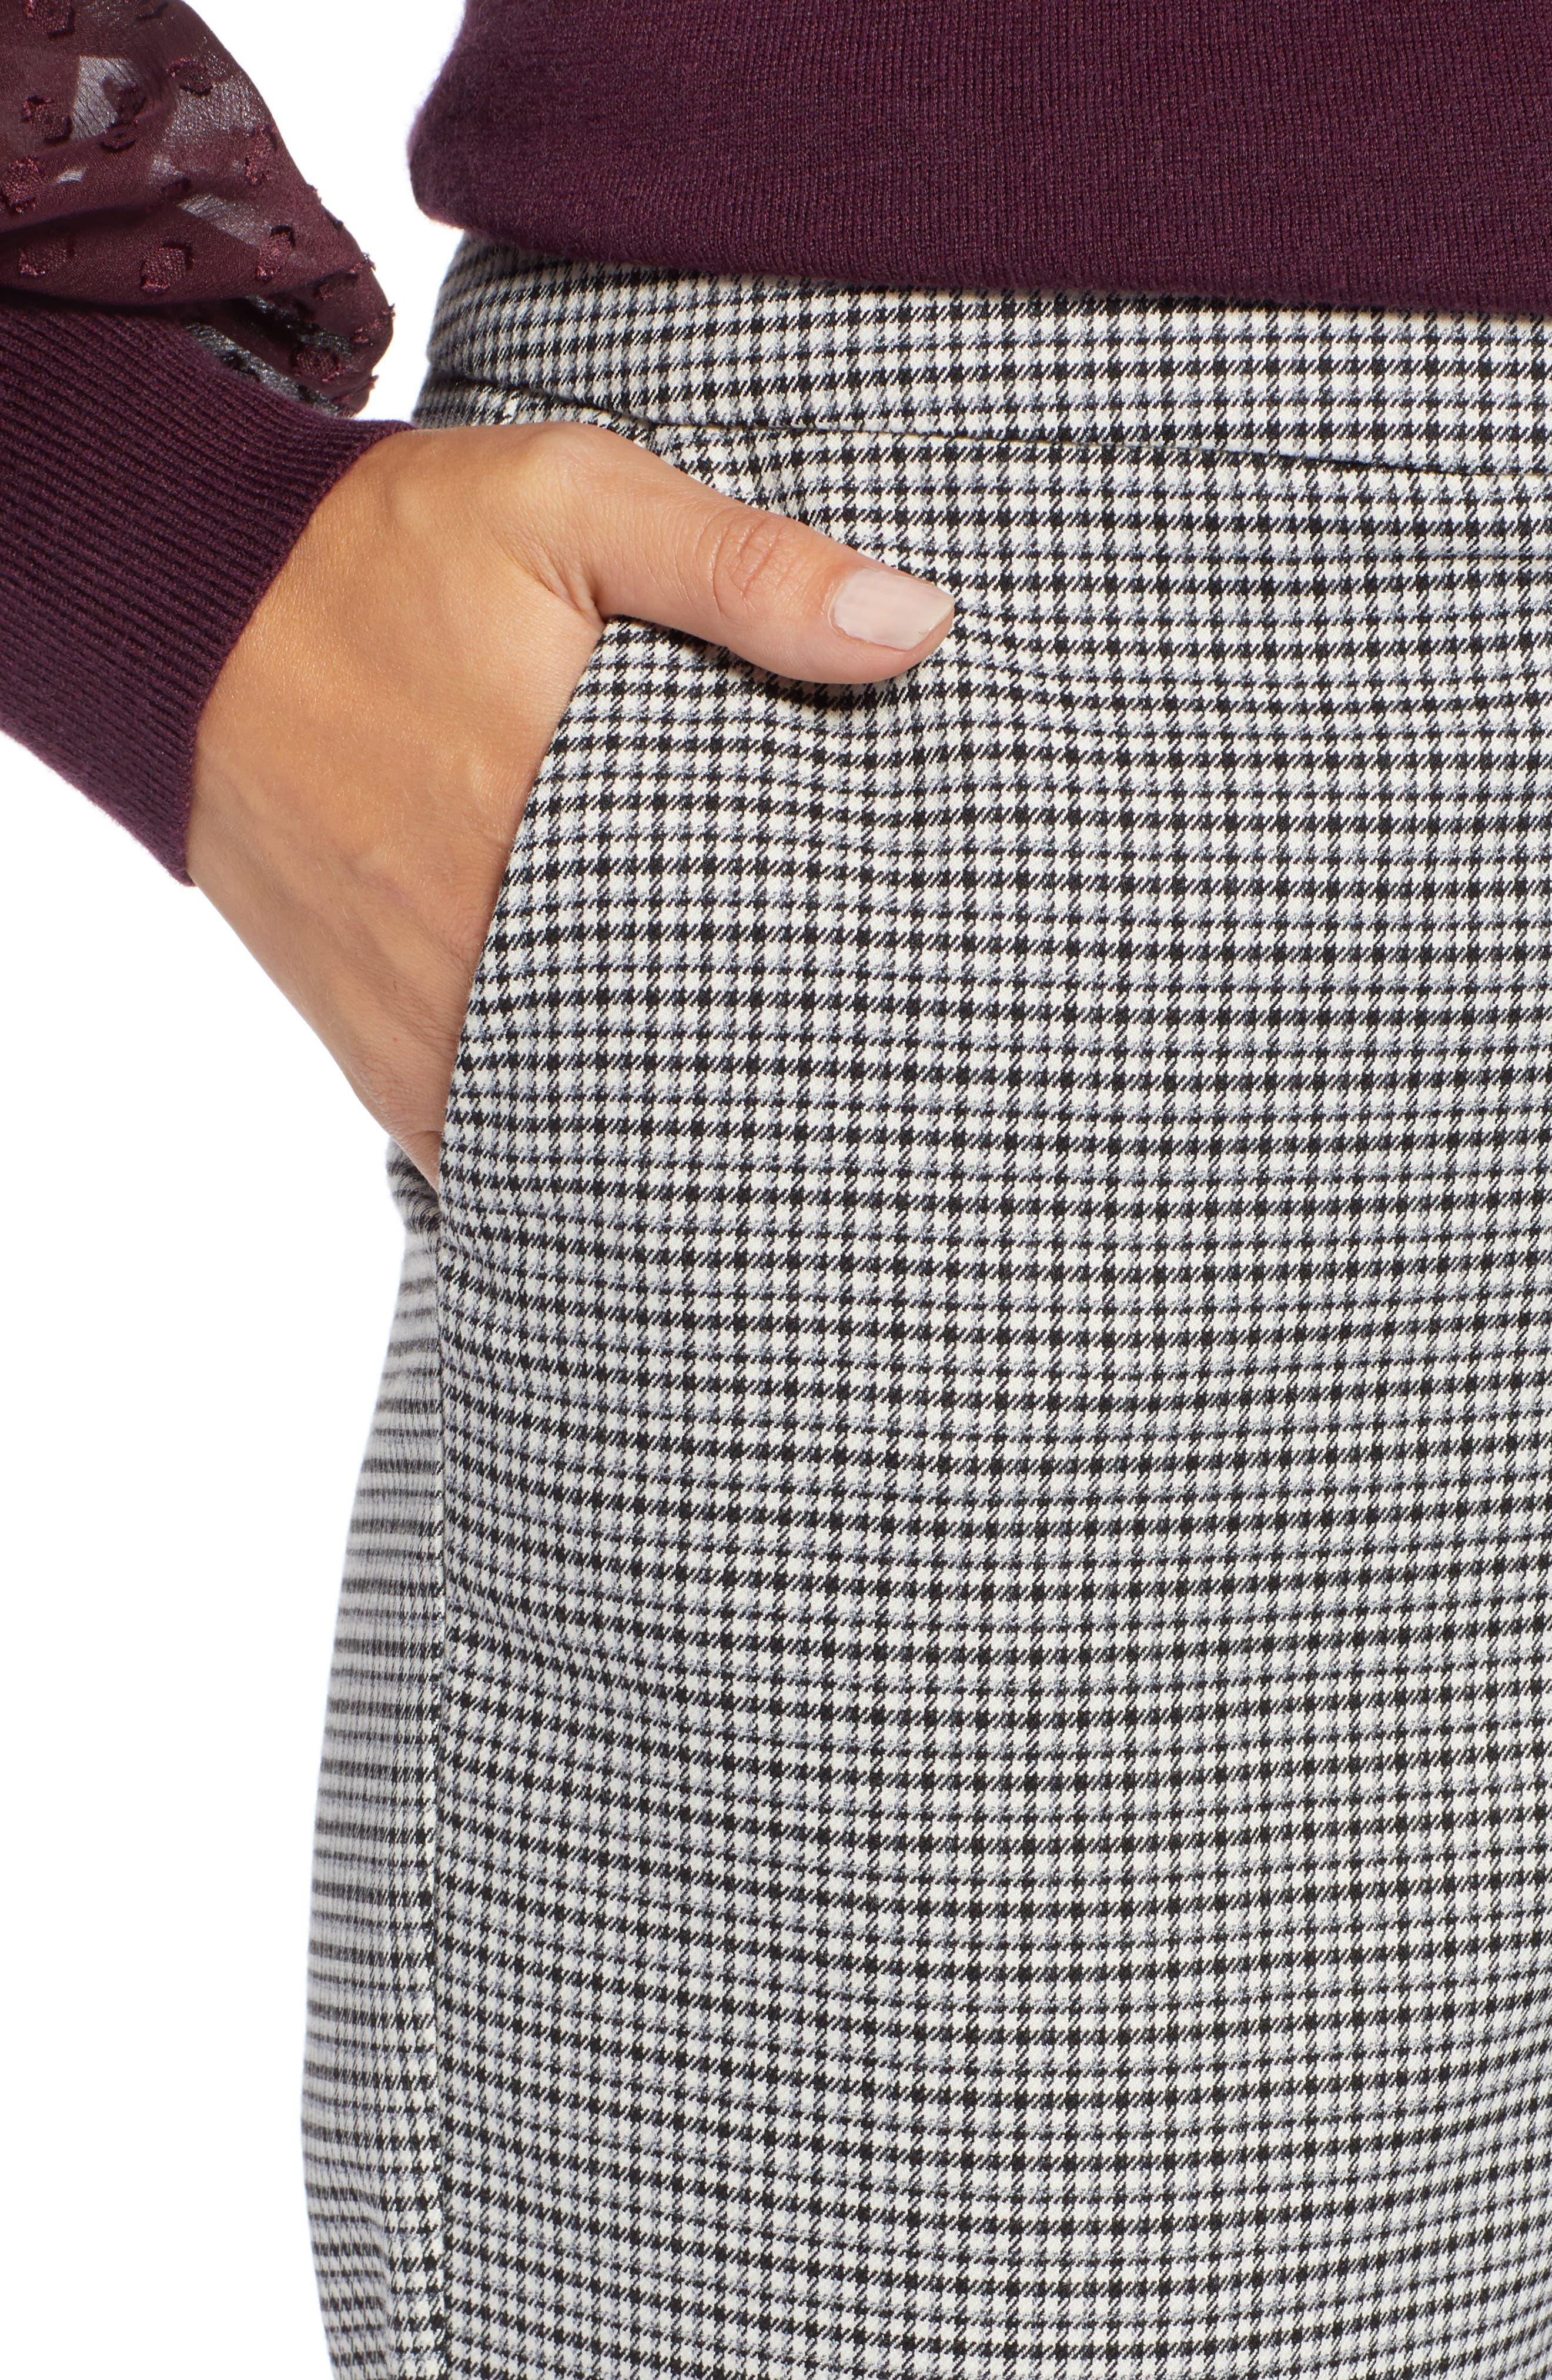 High Rise Skinny Ankle Pants,                             Alternate thumbnail 6, color,                             BLACK- IVORY PATTERN